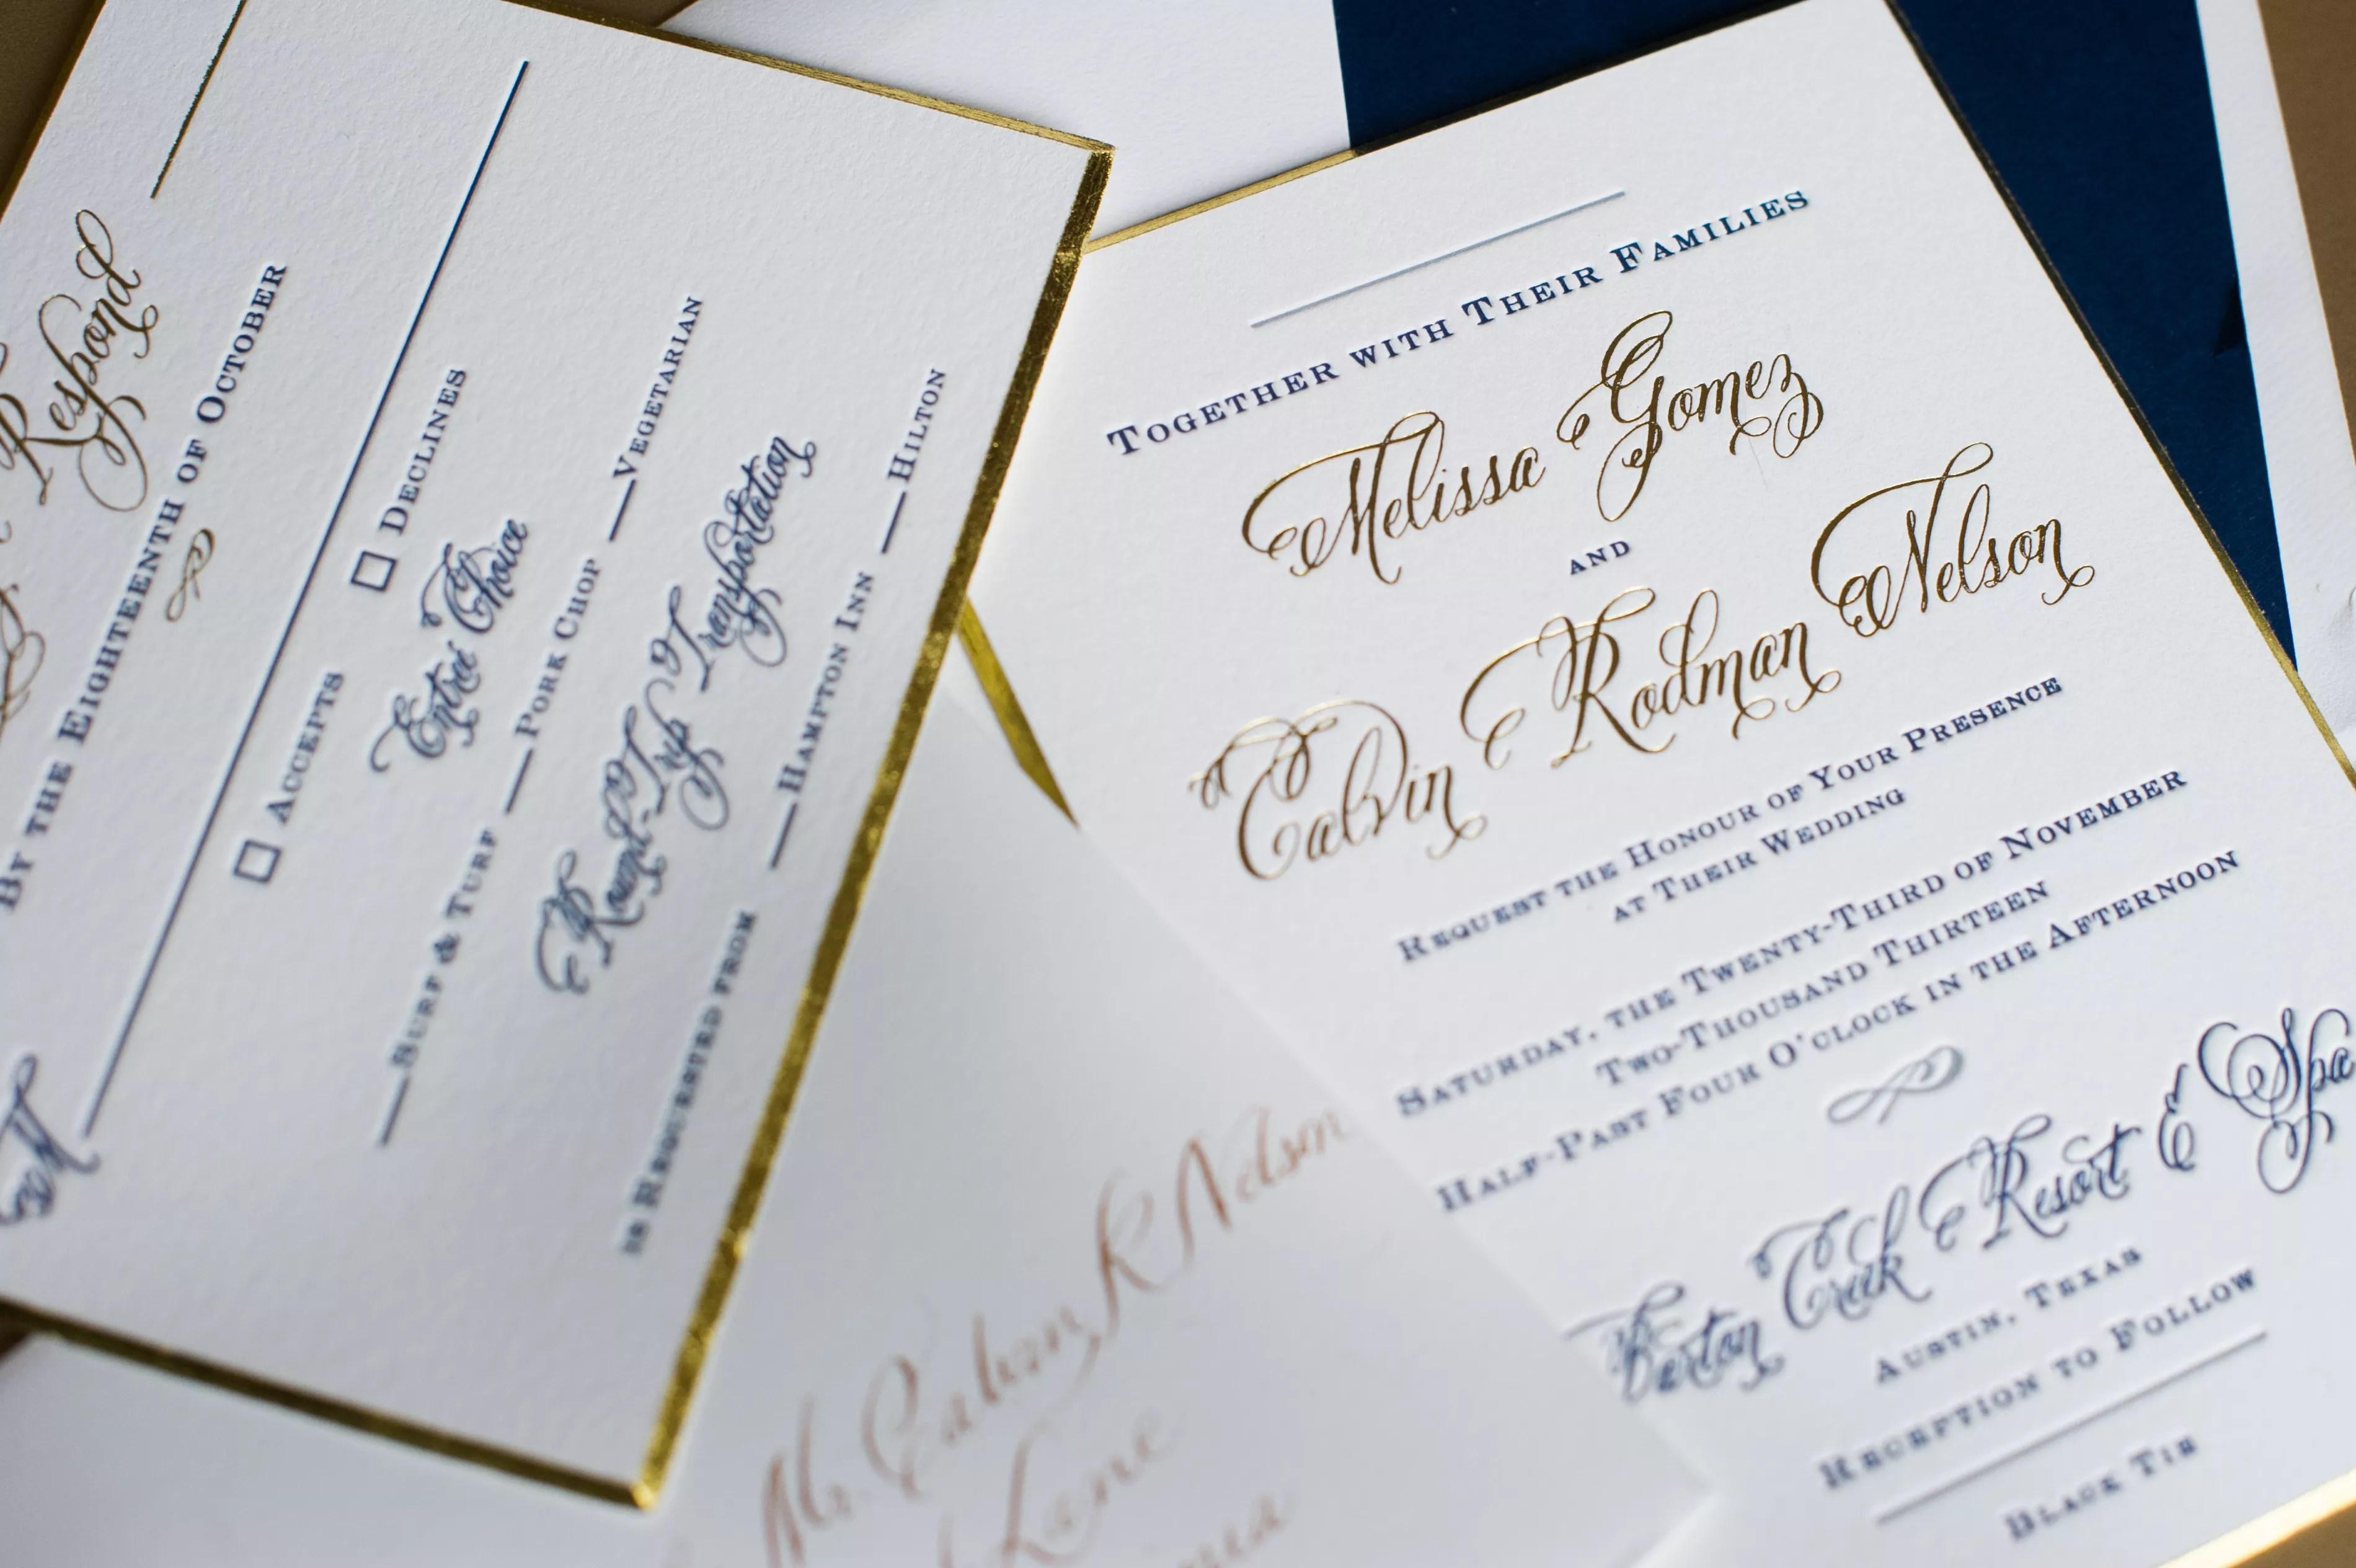 glamorous wedding invitations photos formal wedding invitations Navy and Gold Formal Wedding Invitations